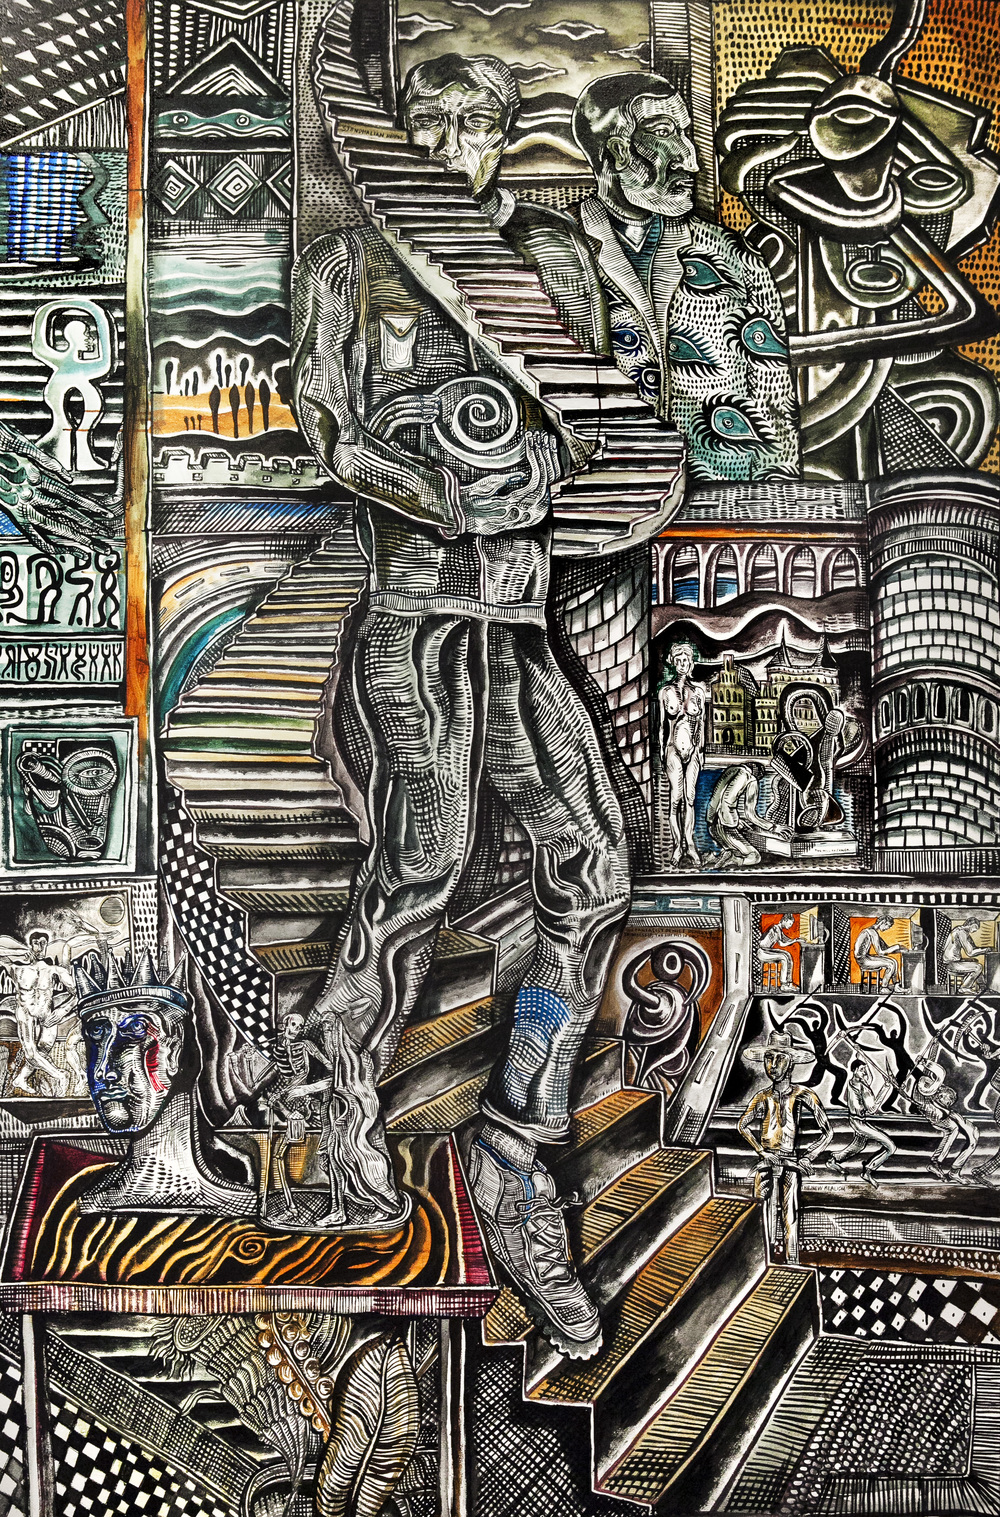 Zio Ziegler @ Condition - Athen B. Gallery